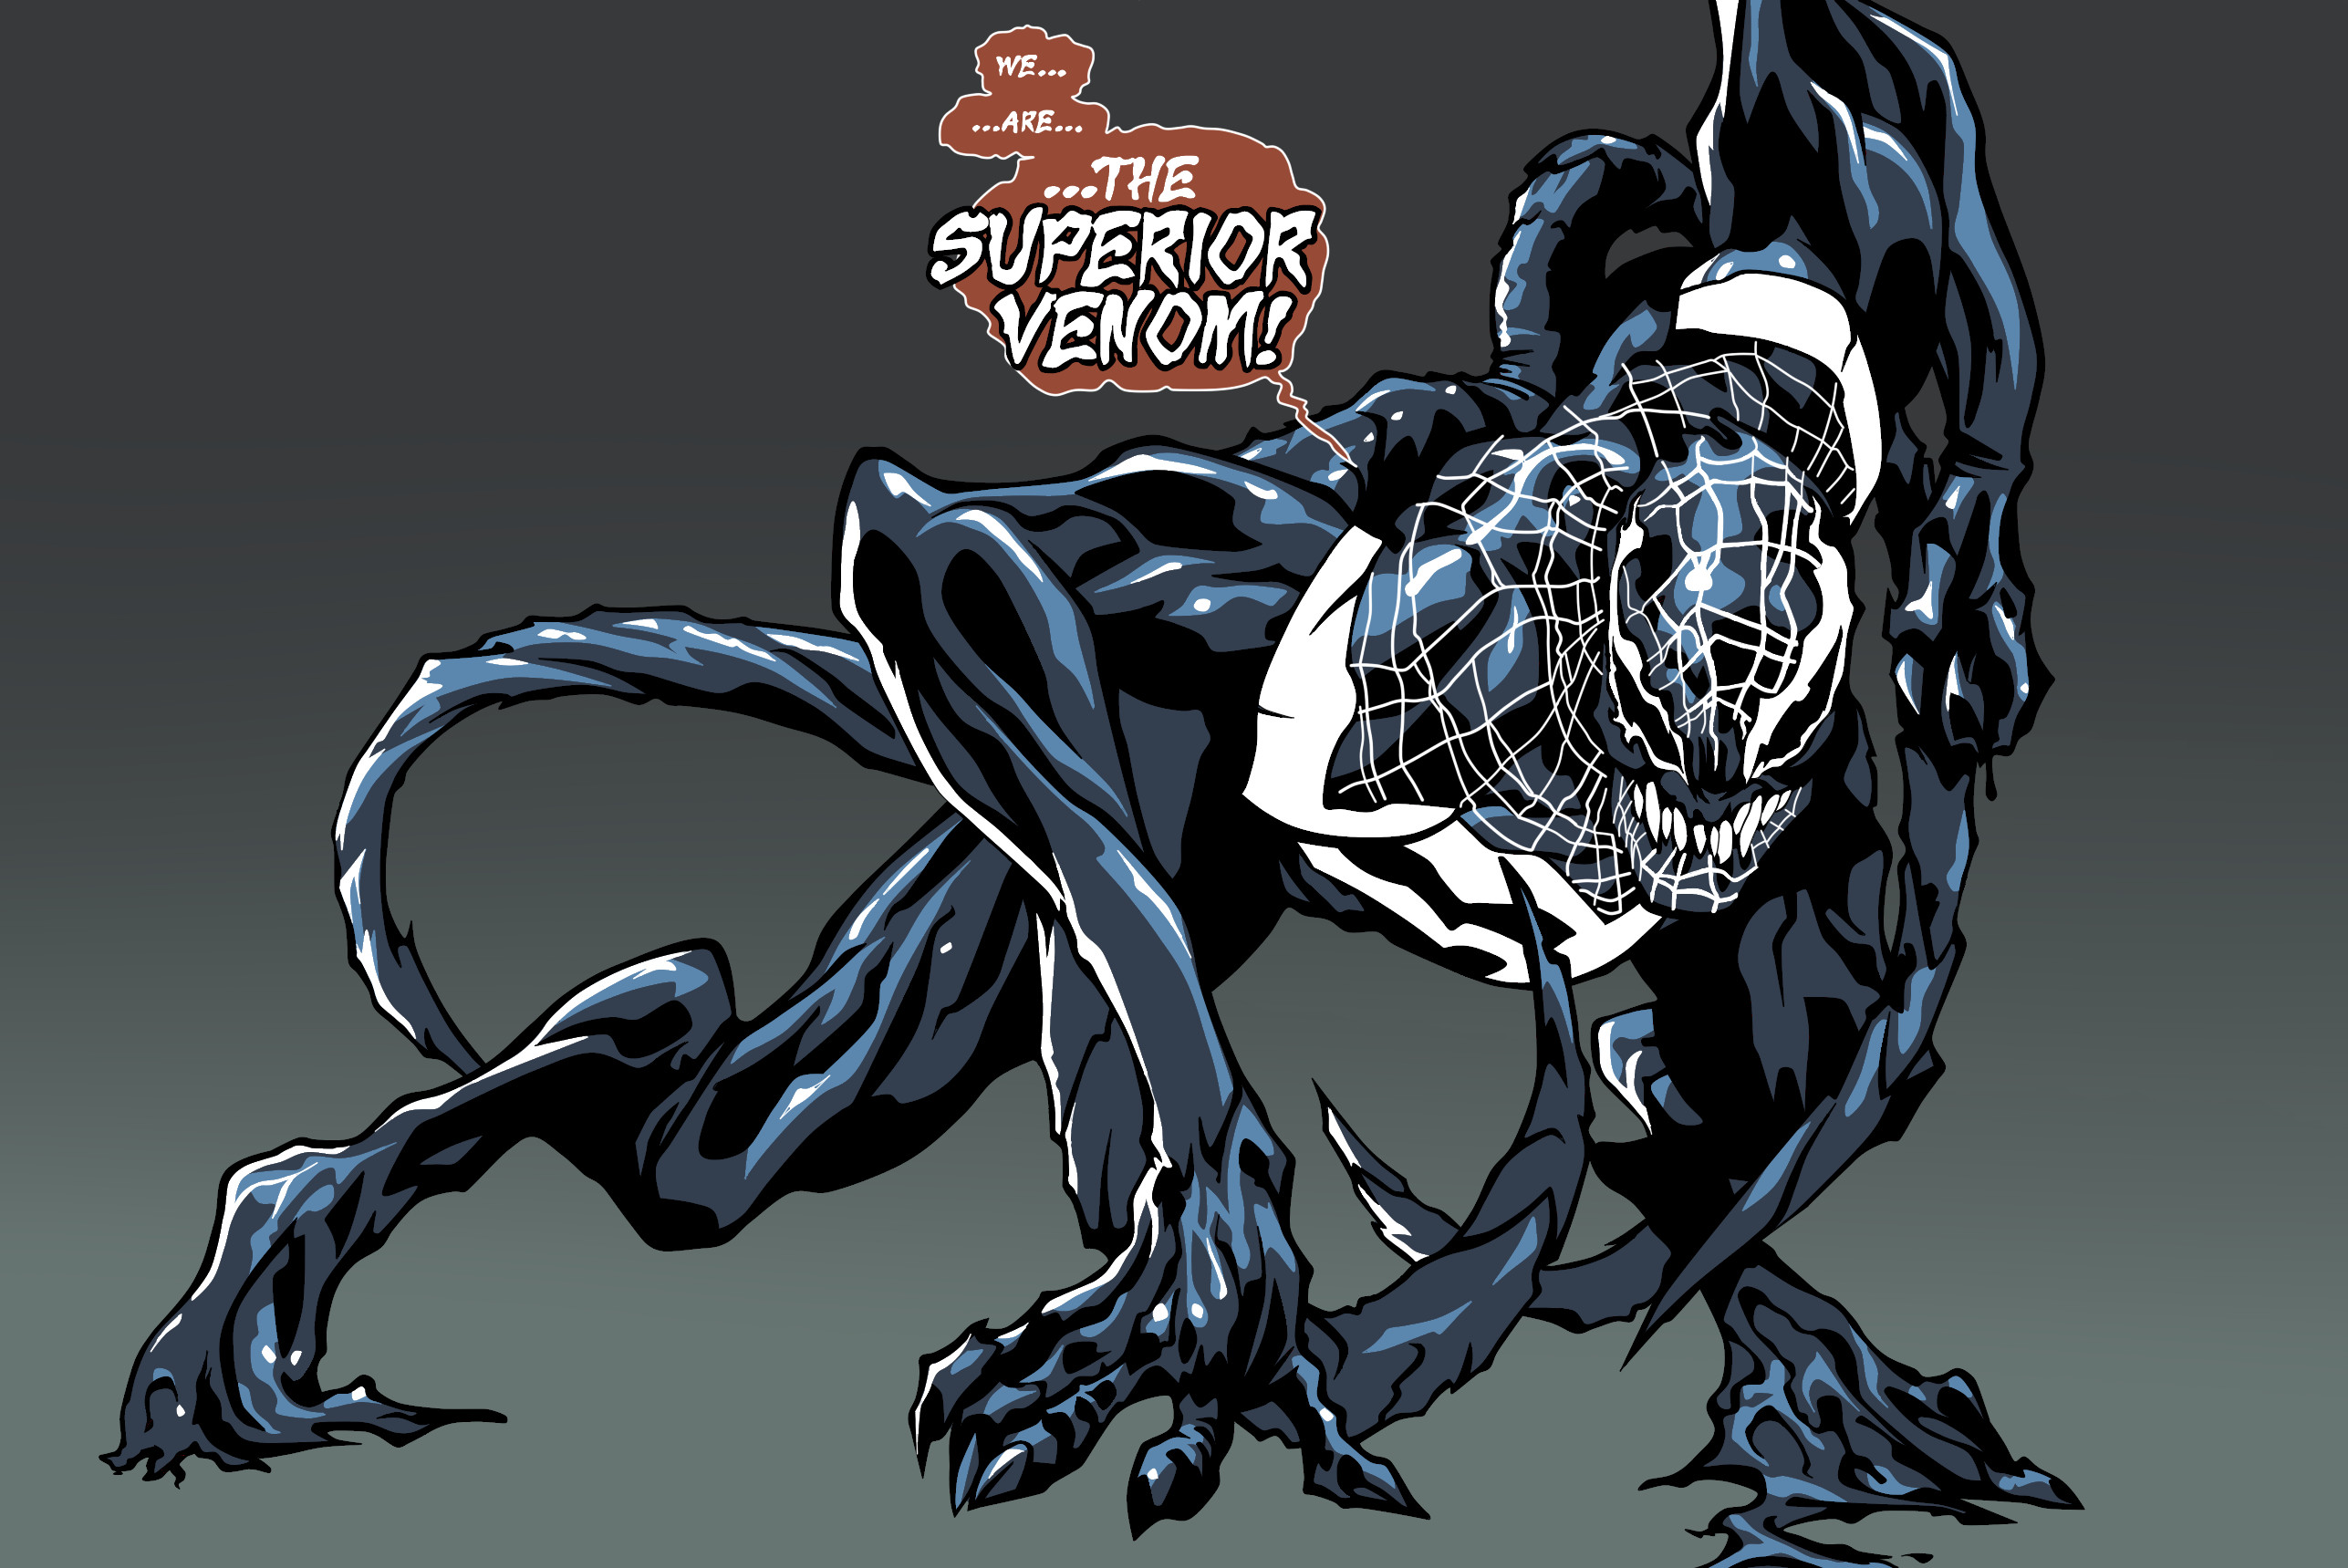 Superior Venom by kyouji-kuzunoha Superior Venom by kyouji-kuzunoha